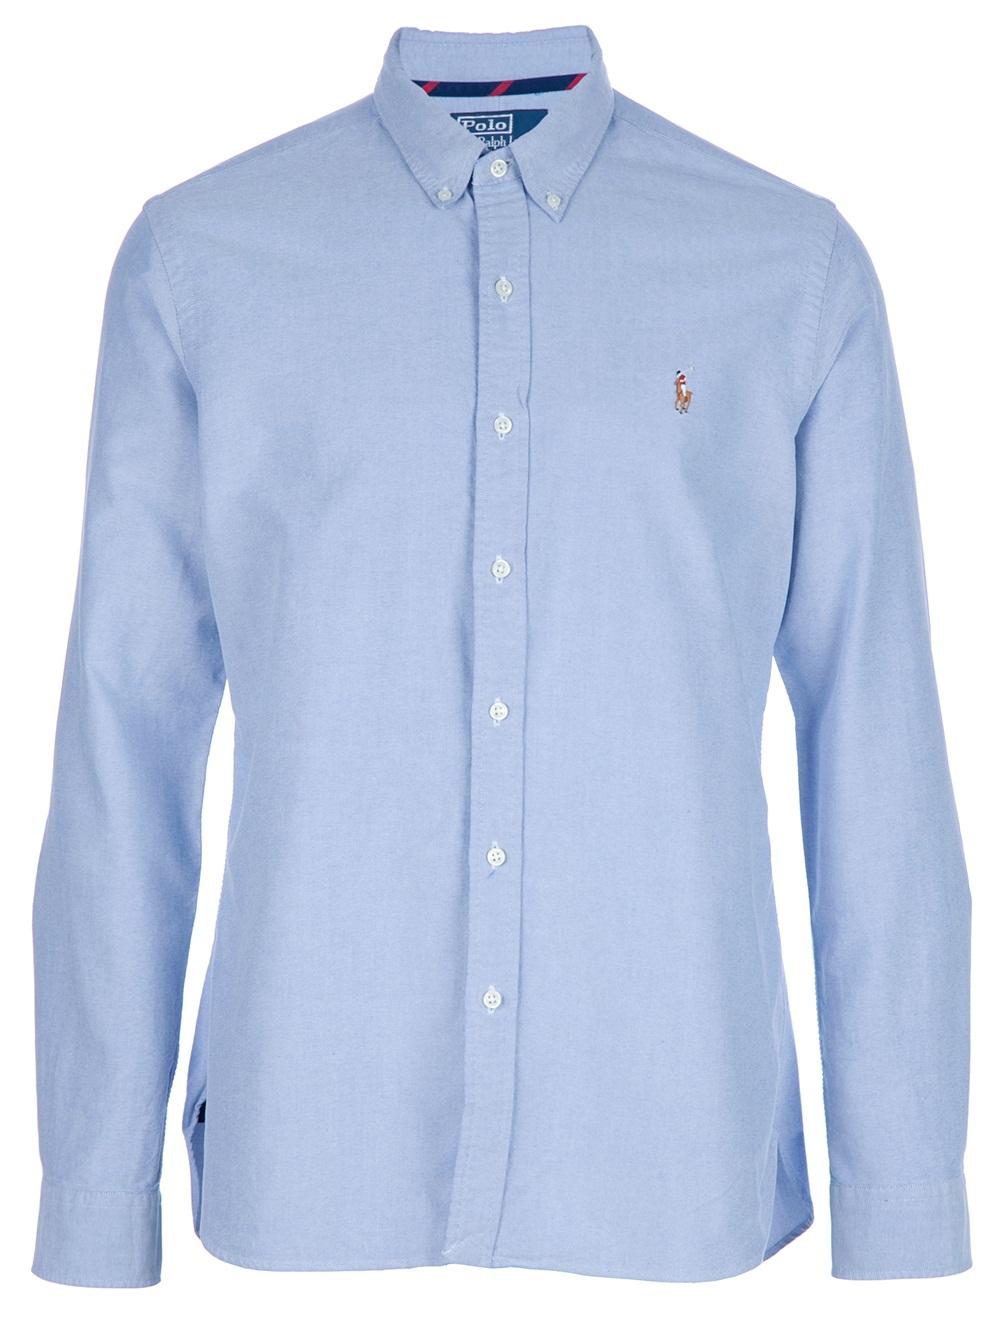 Polo Ralph Lauren Oxford Shirt,$123.82 at Far Fetch